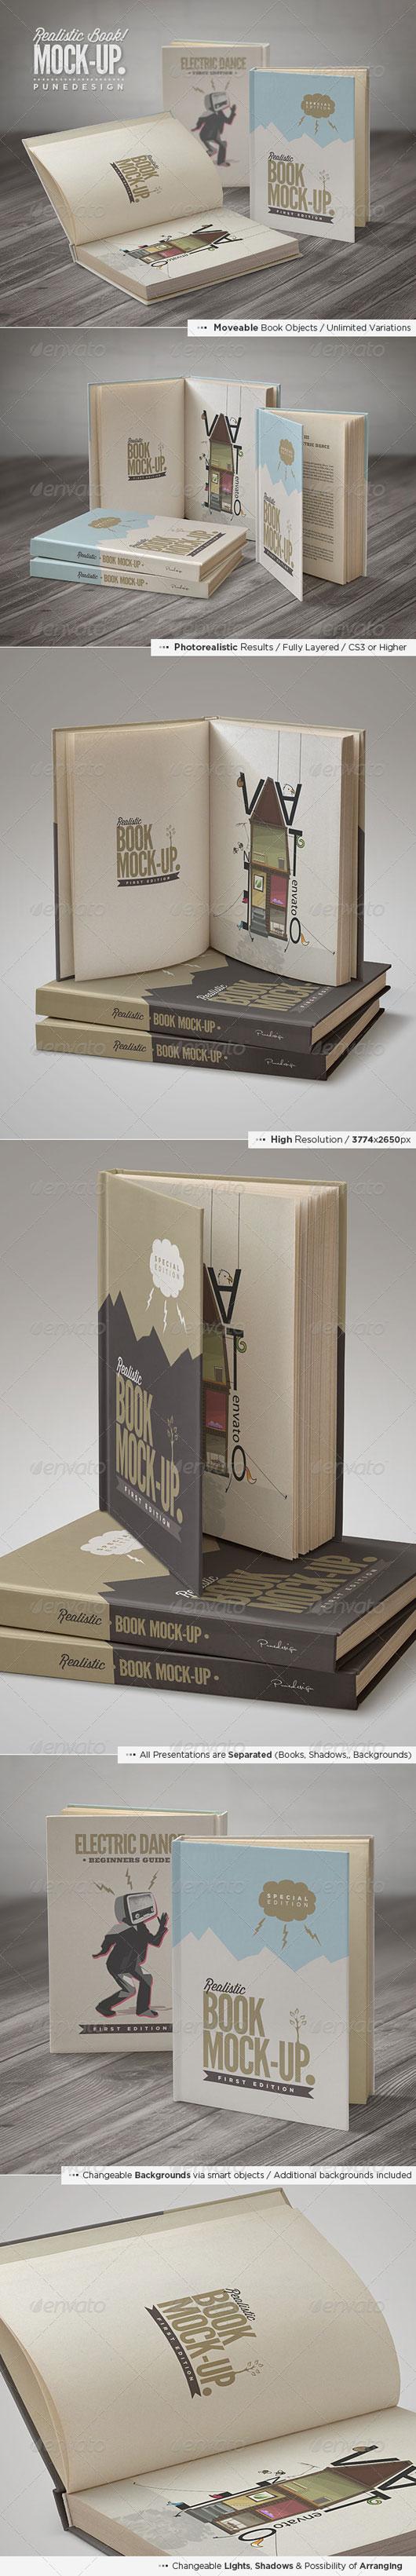 Best Book Mockups